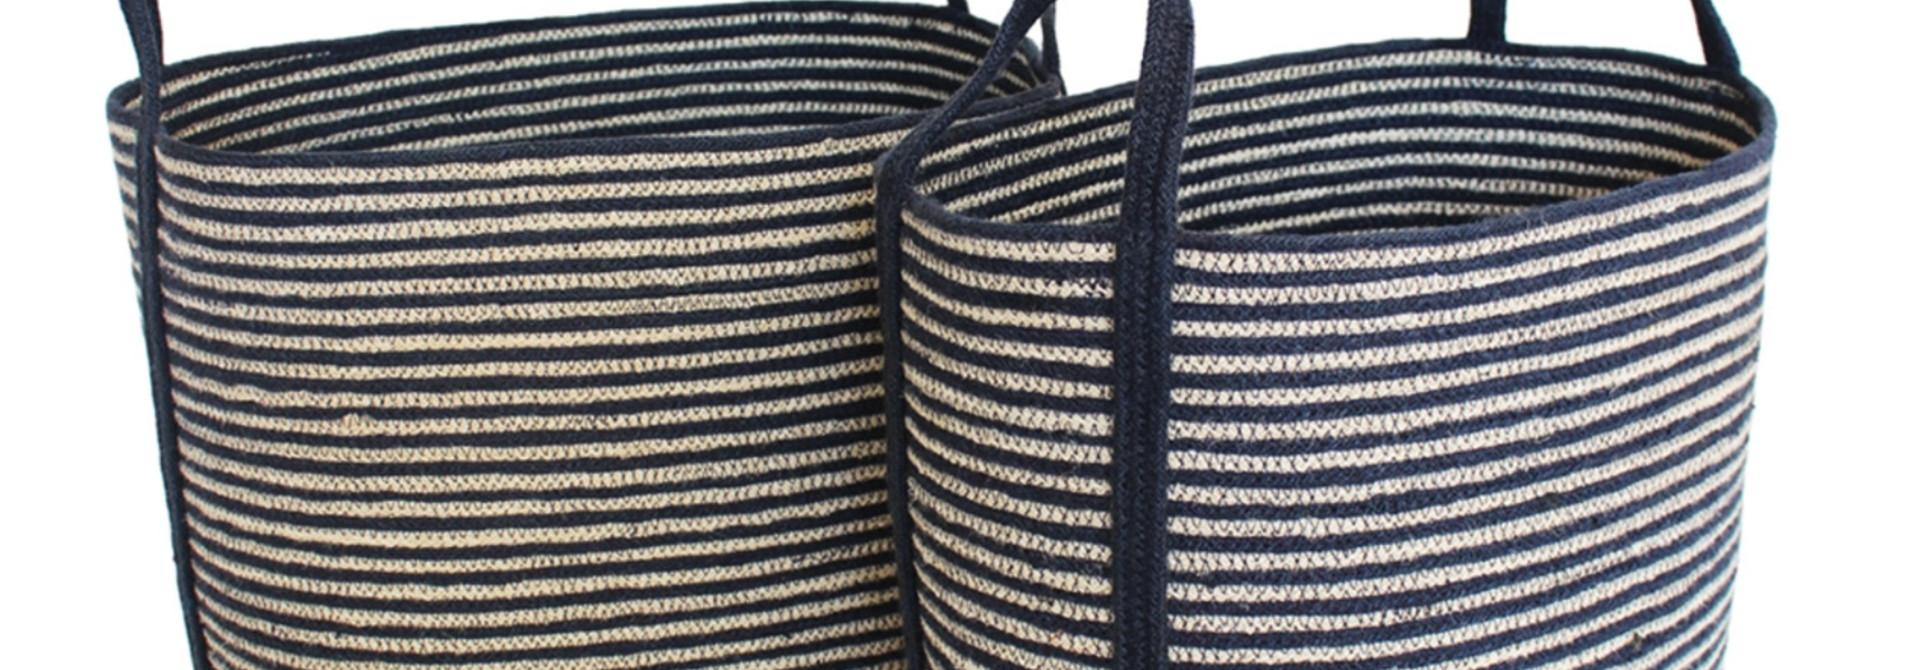 Jute Oval Tote Laundry Basket - Large